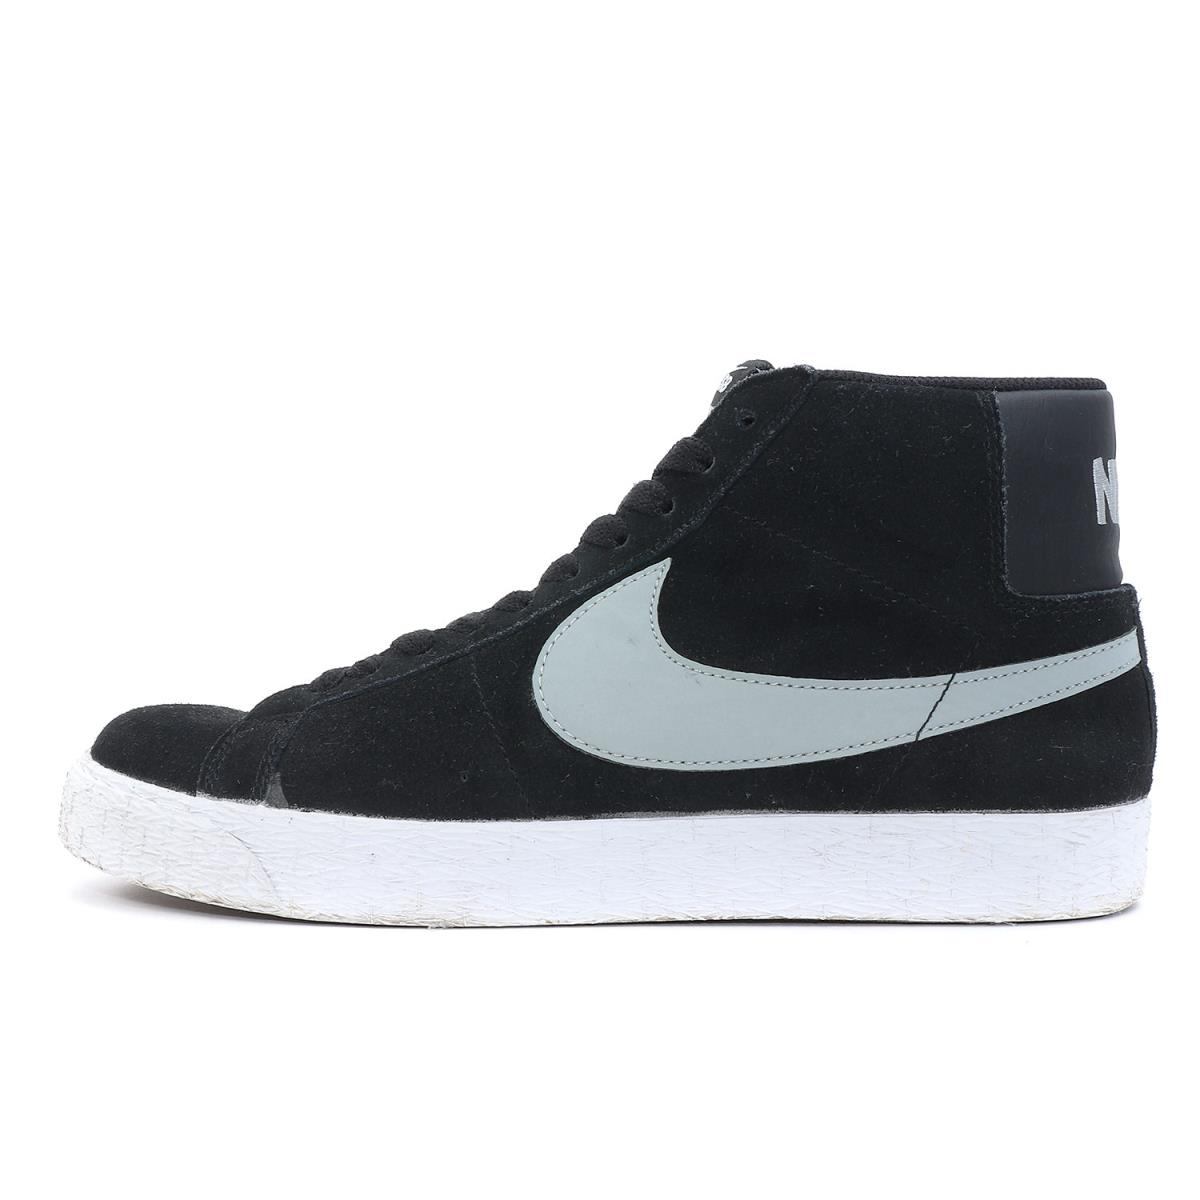 buying cheap shopping authentic quality NIKE (Nike) BLAZER SB PREMIUM SE (631,042-003) black US9(27cm)